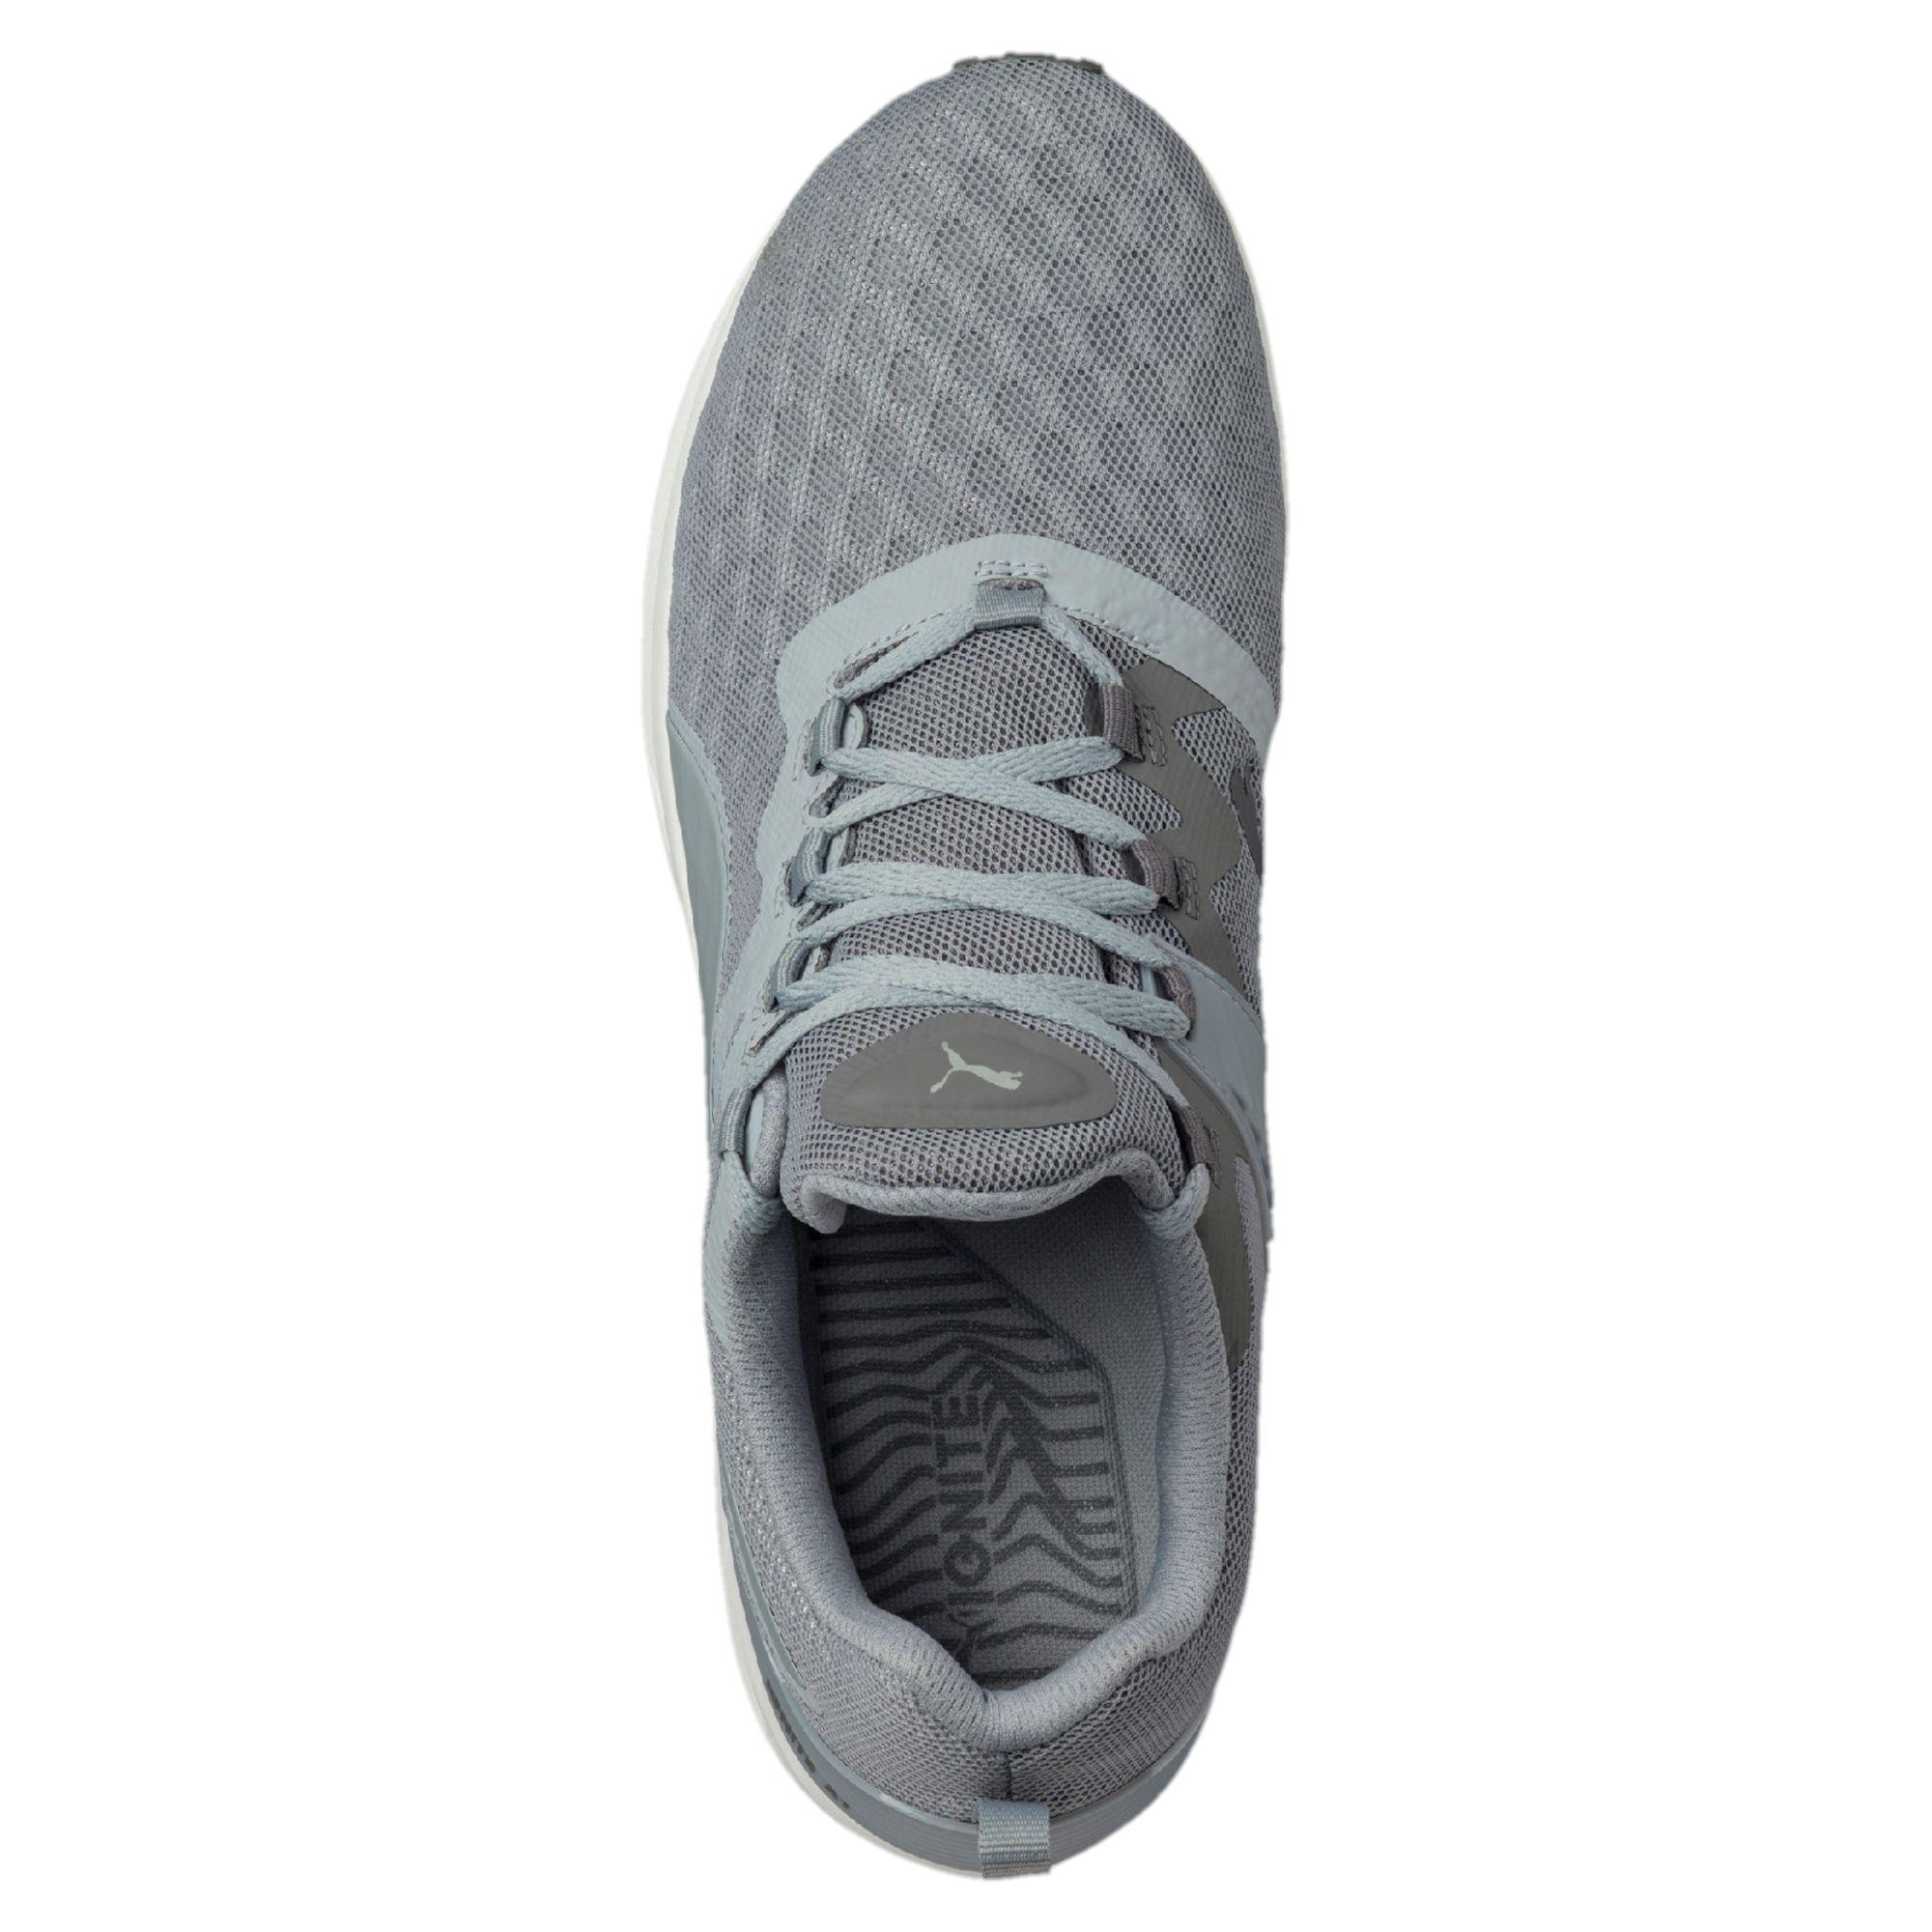 PUMA IGNITE XT v2 Mesh Herren Trainingsschuhe Männer Schuhe Training Neu